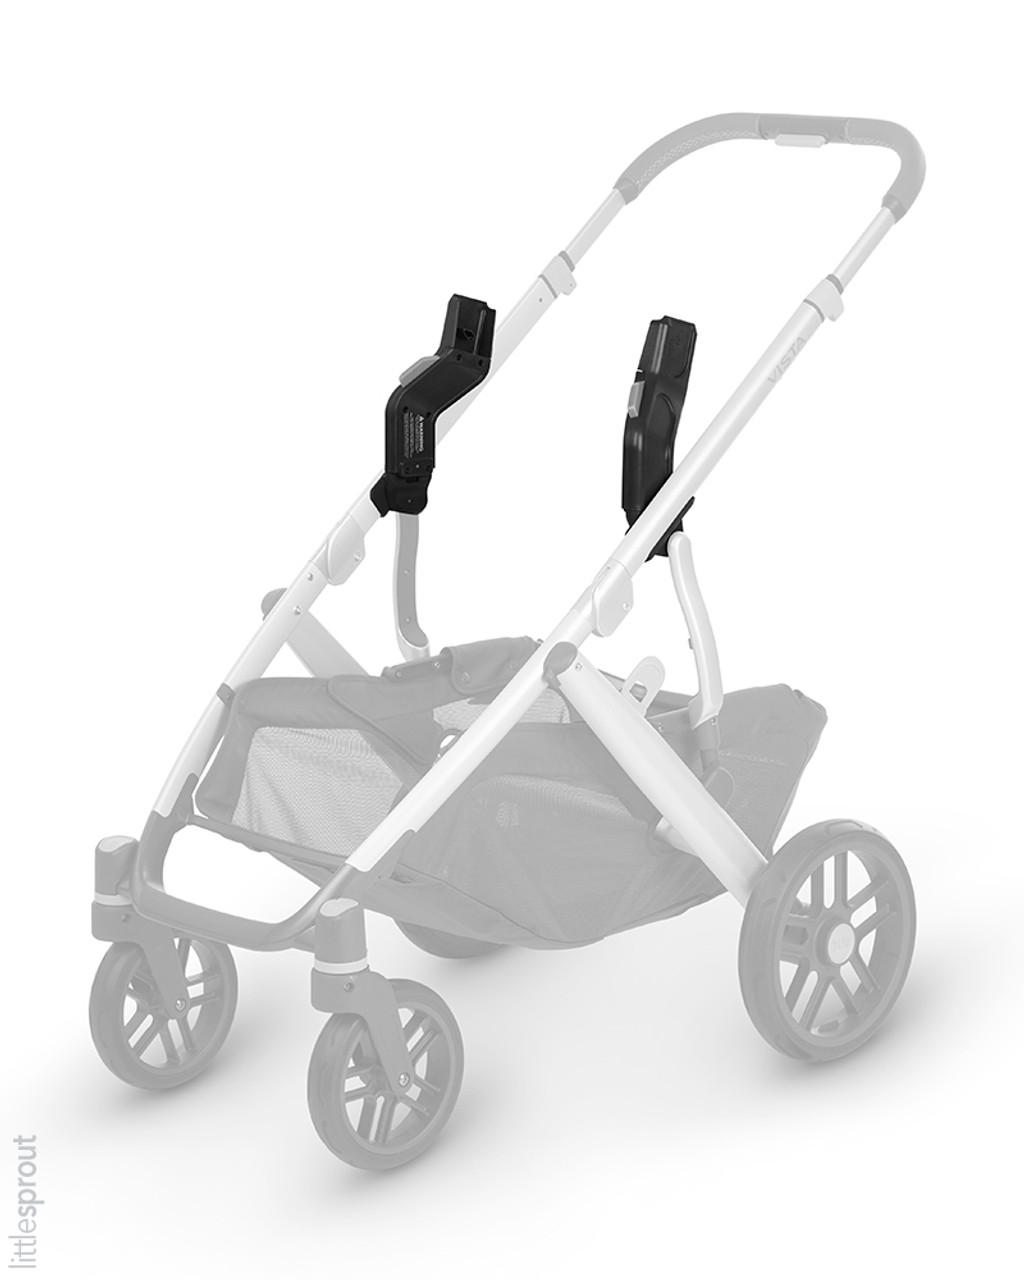 Stokke Car Seat Adapter for Maxi COSI//Multi Black